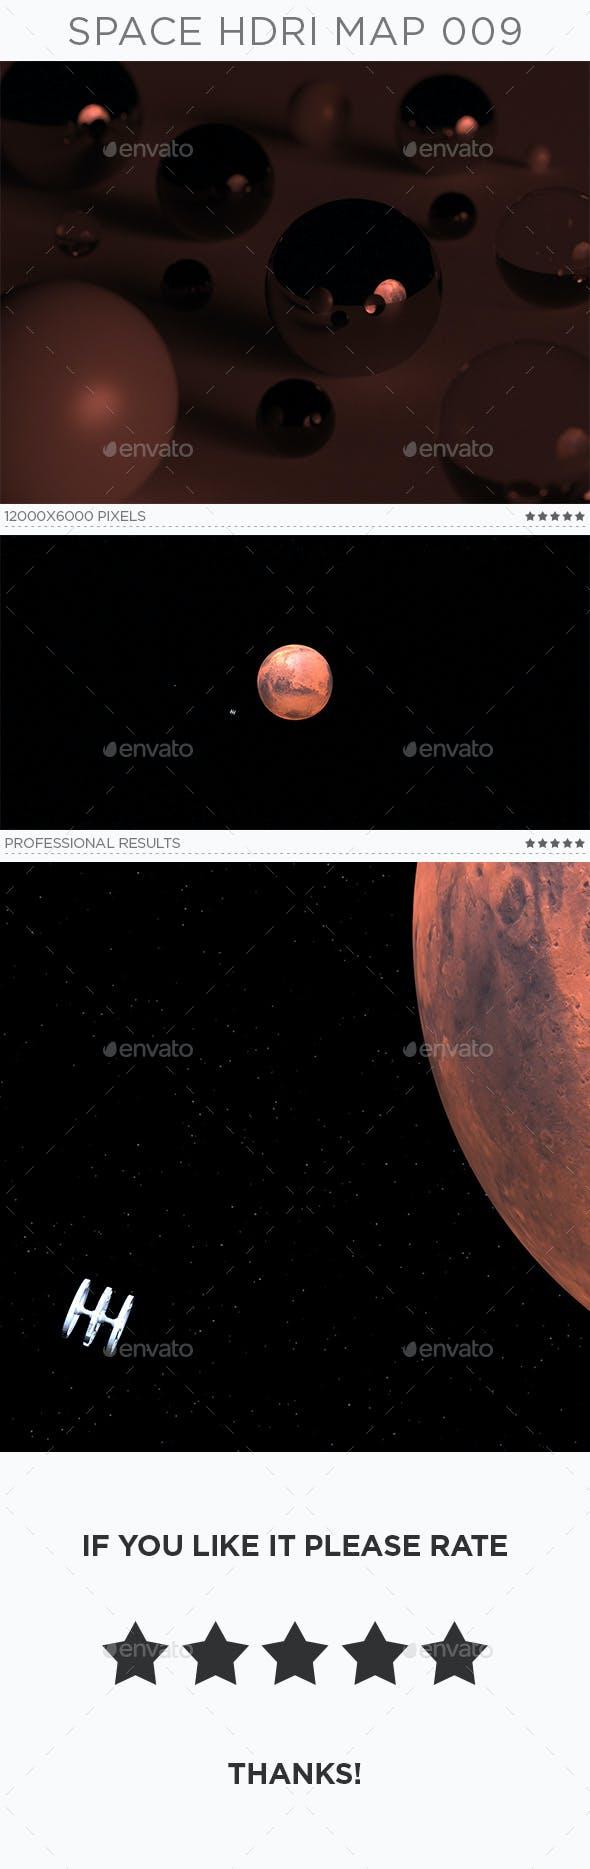 Space HDRi Map 009 - 3DOcean Item for Sale